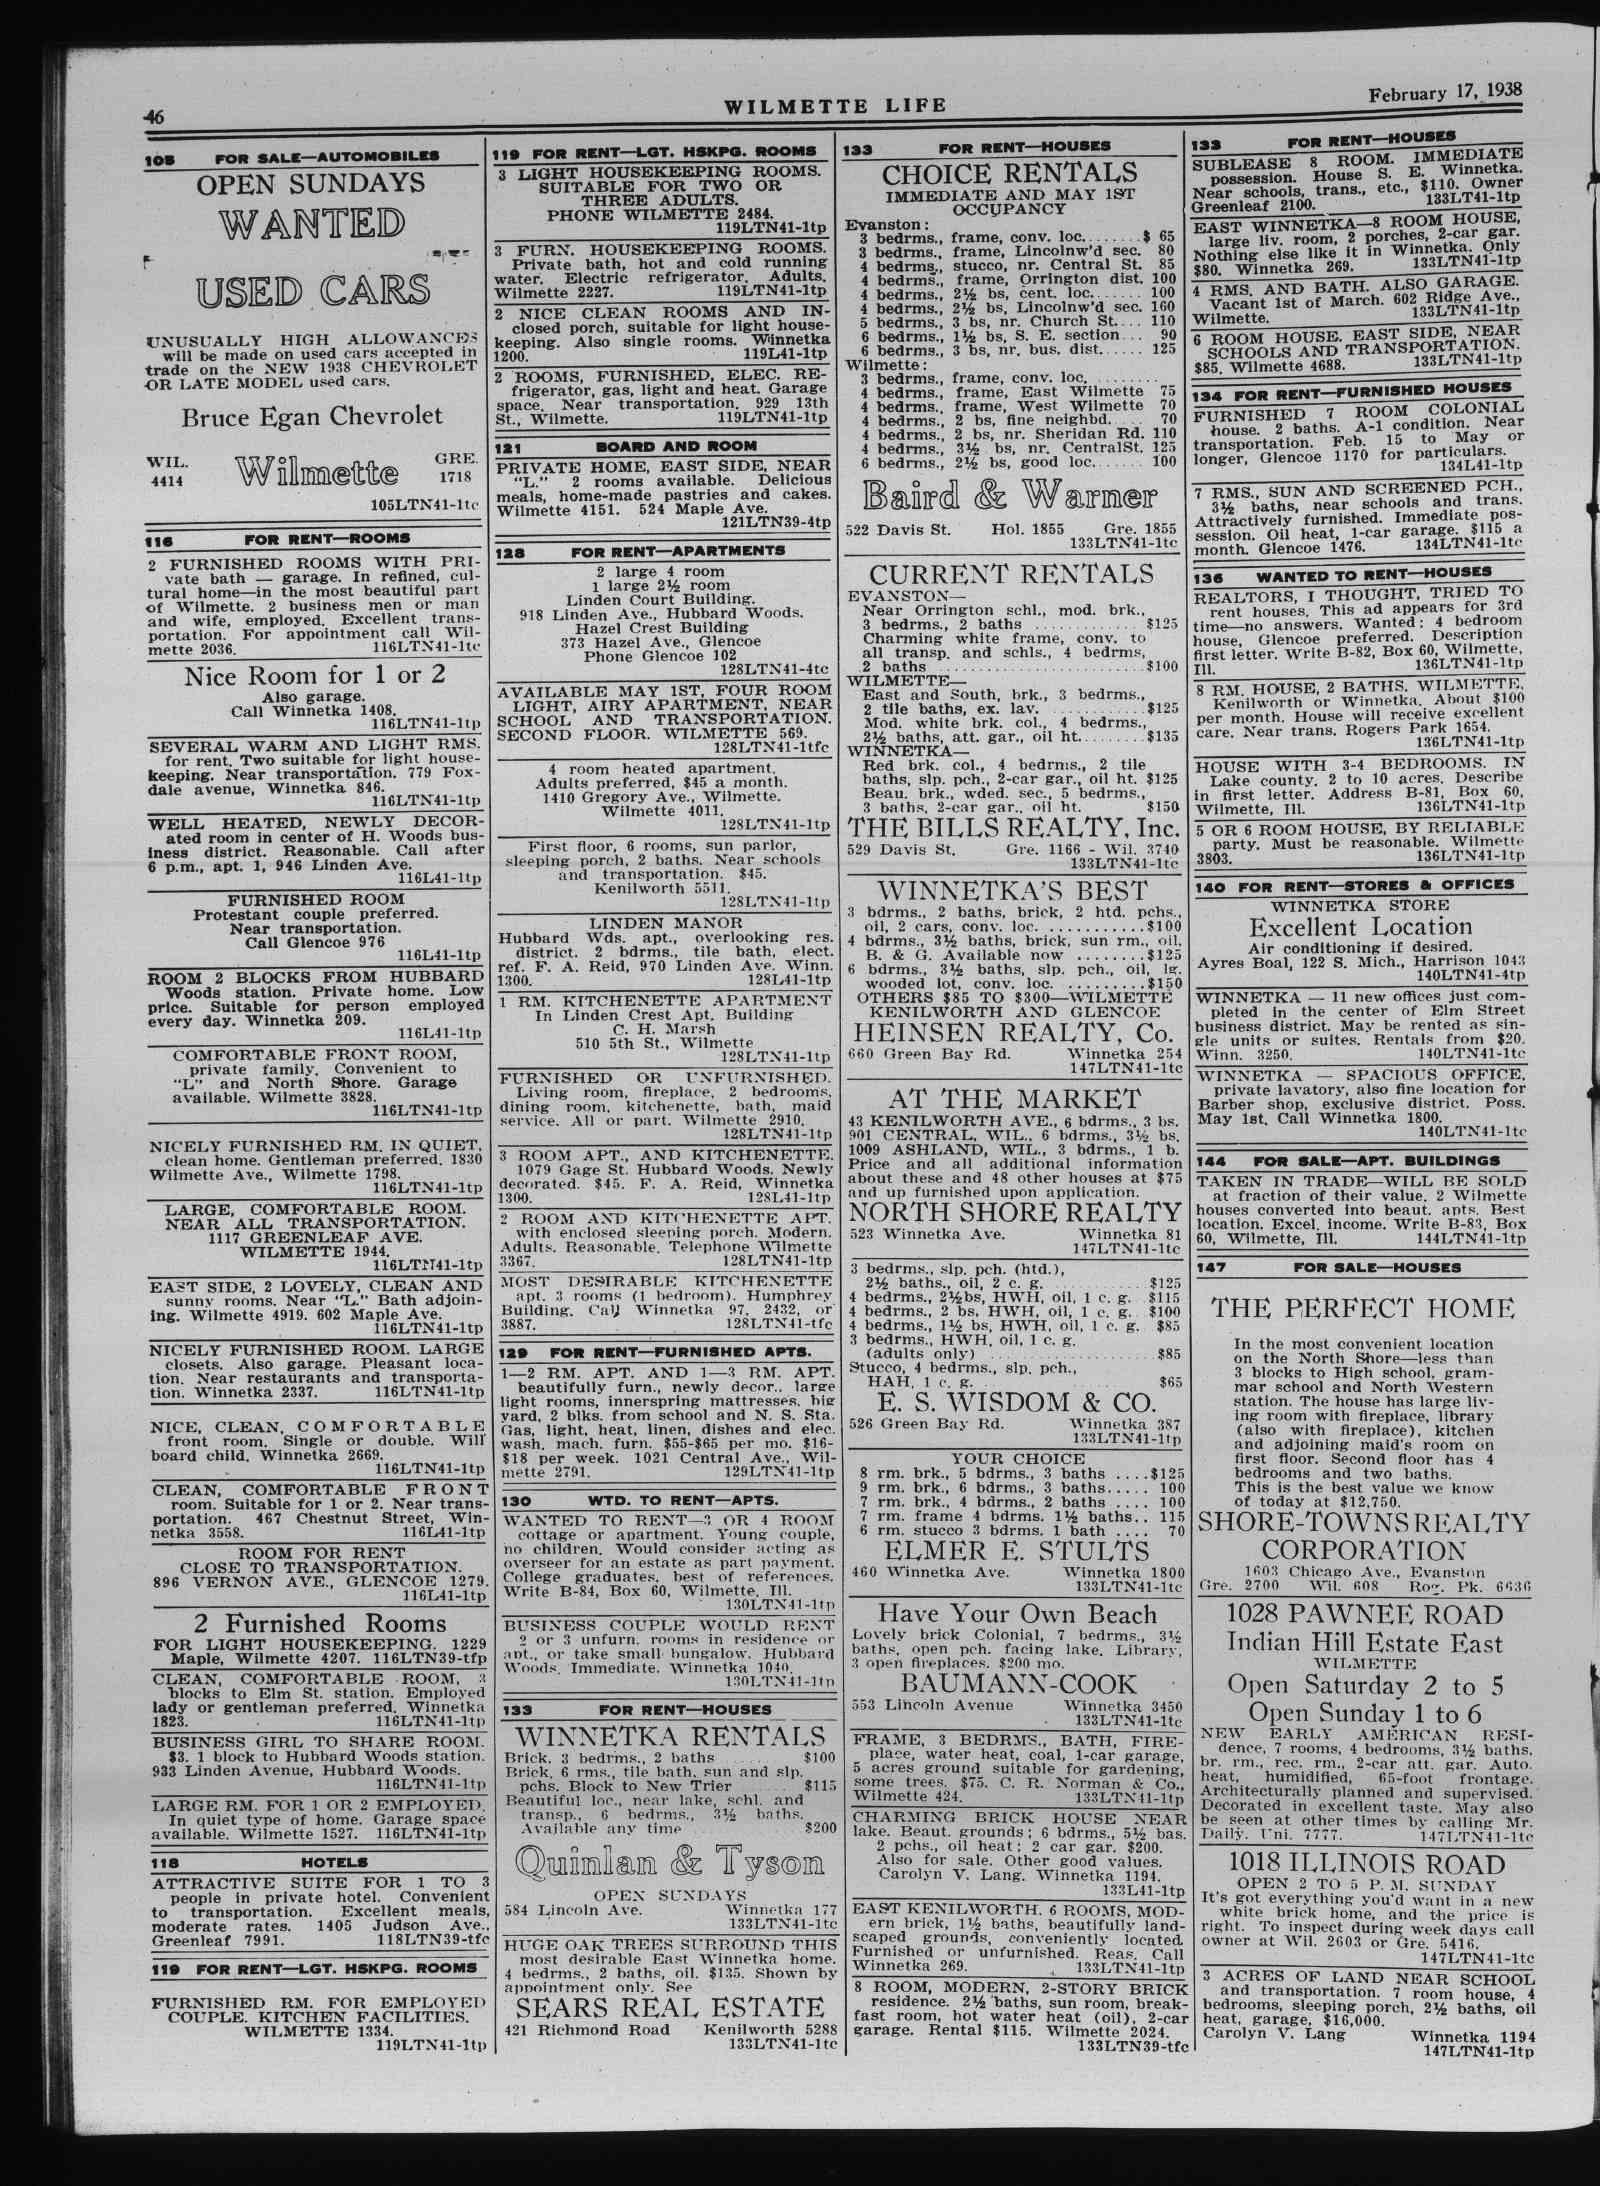 Wilmette Life (Wilmette, Illinois), 17 Feb 1938